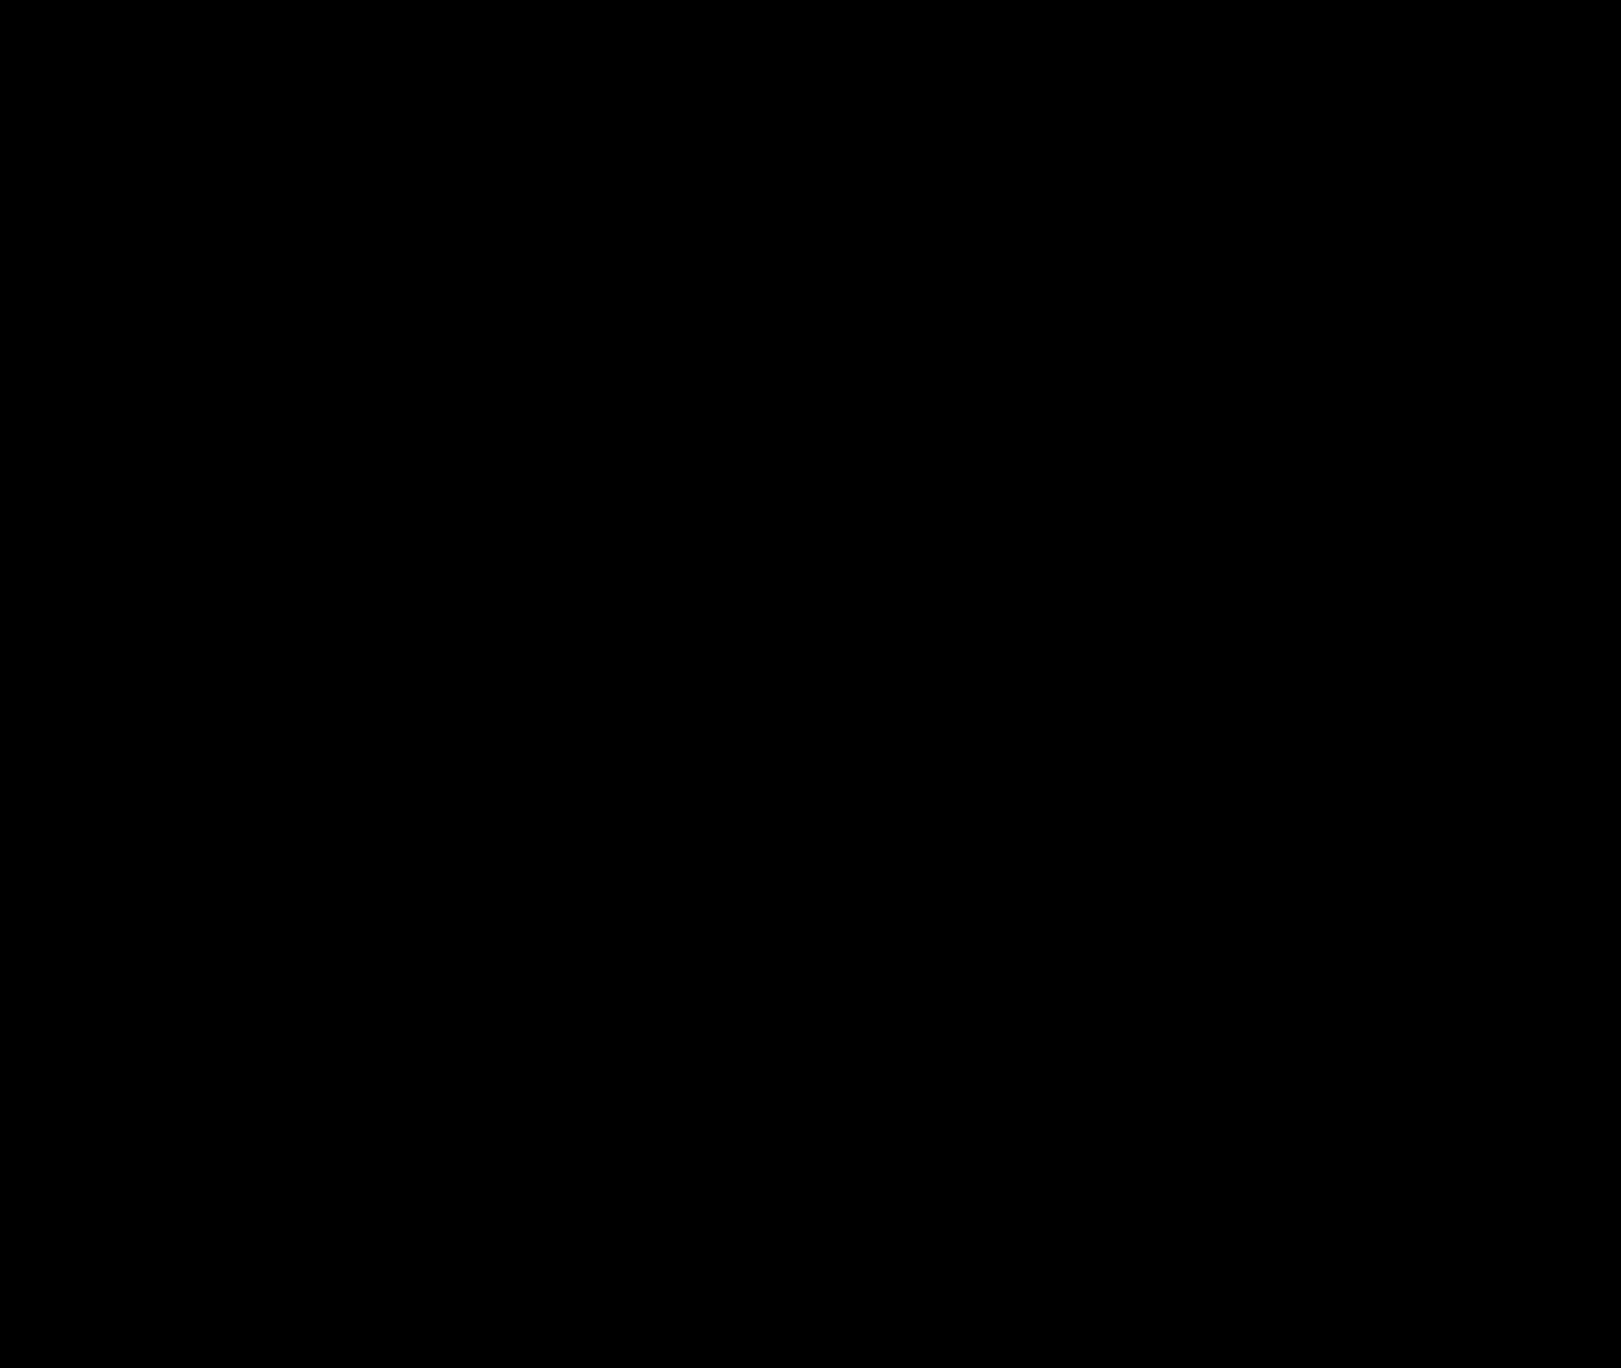 website design company in akron, cleveland, medina, ohio